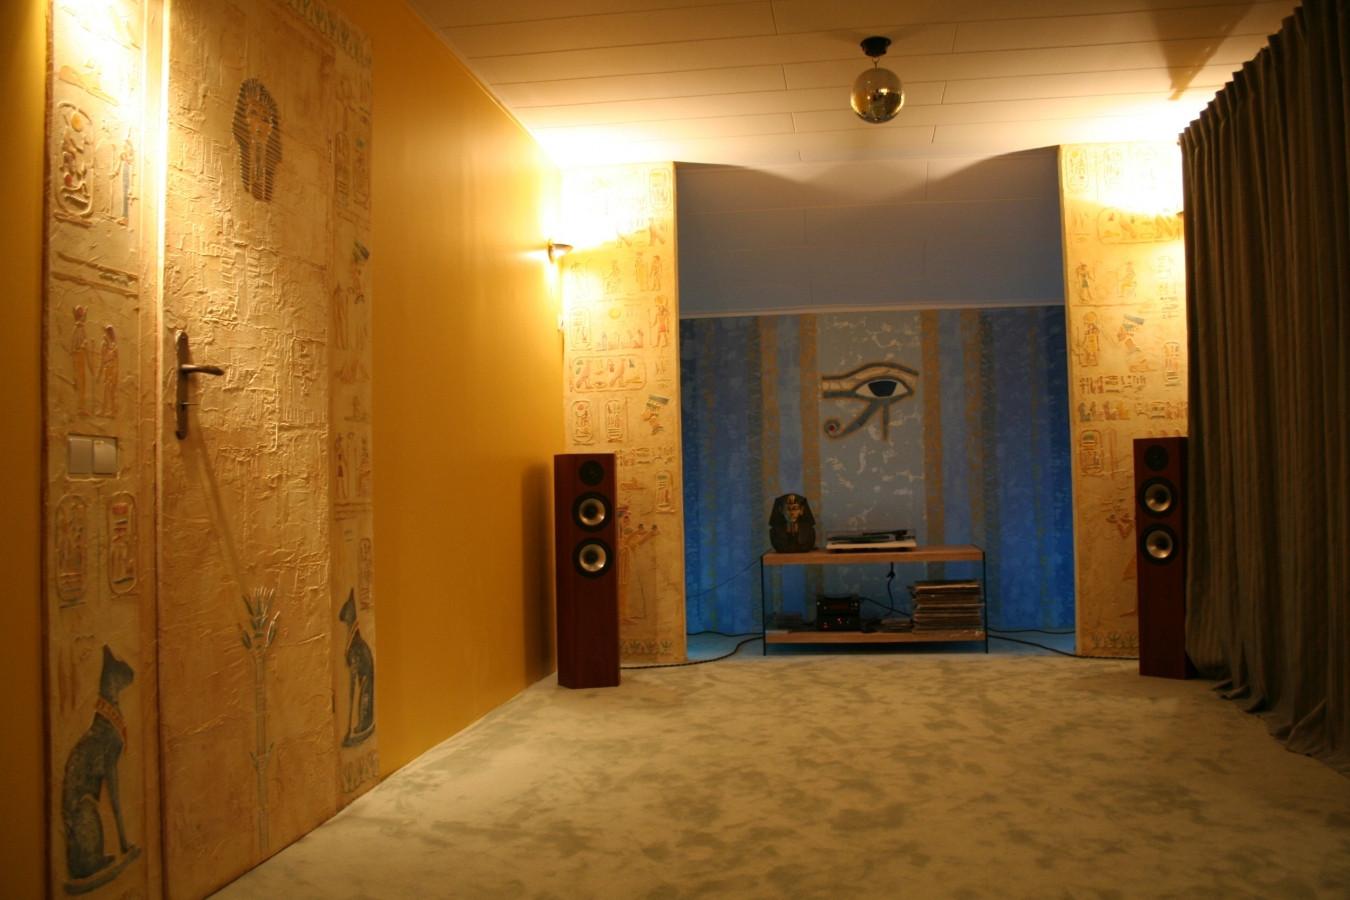 Interjero dekoras Egipto motyvais. Sienų dekoras. Decorated wall. Wall Decor. Embossed wall decor.  Interior design. Egyptian motives.